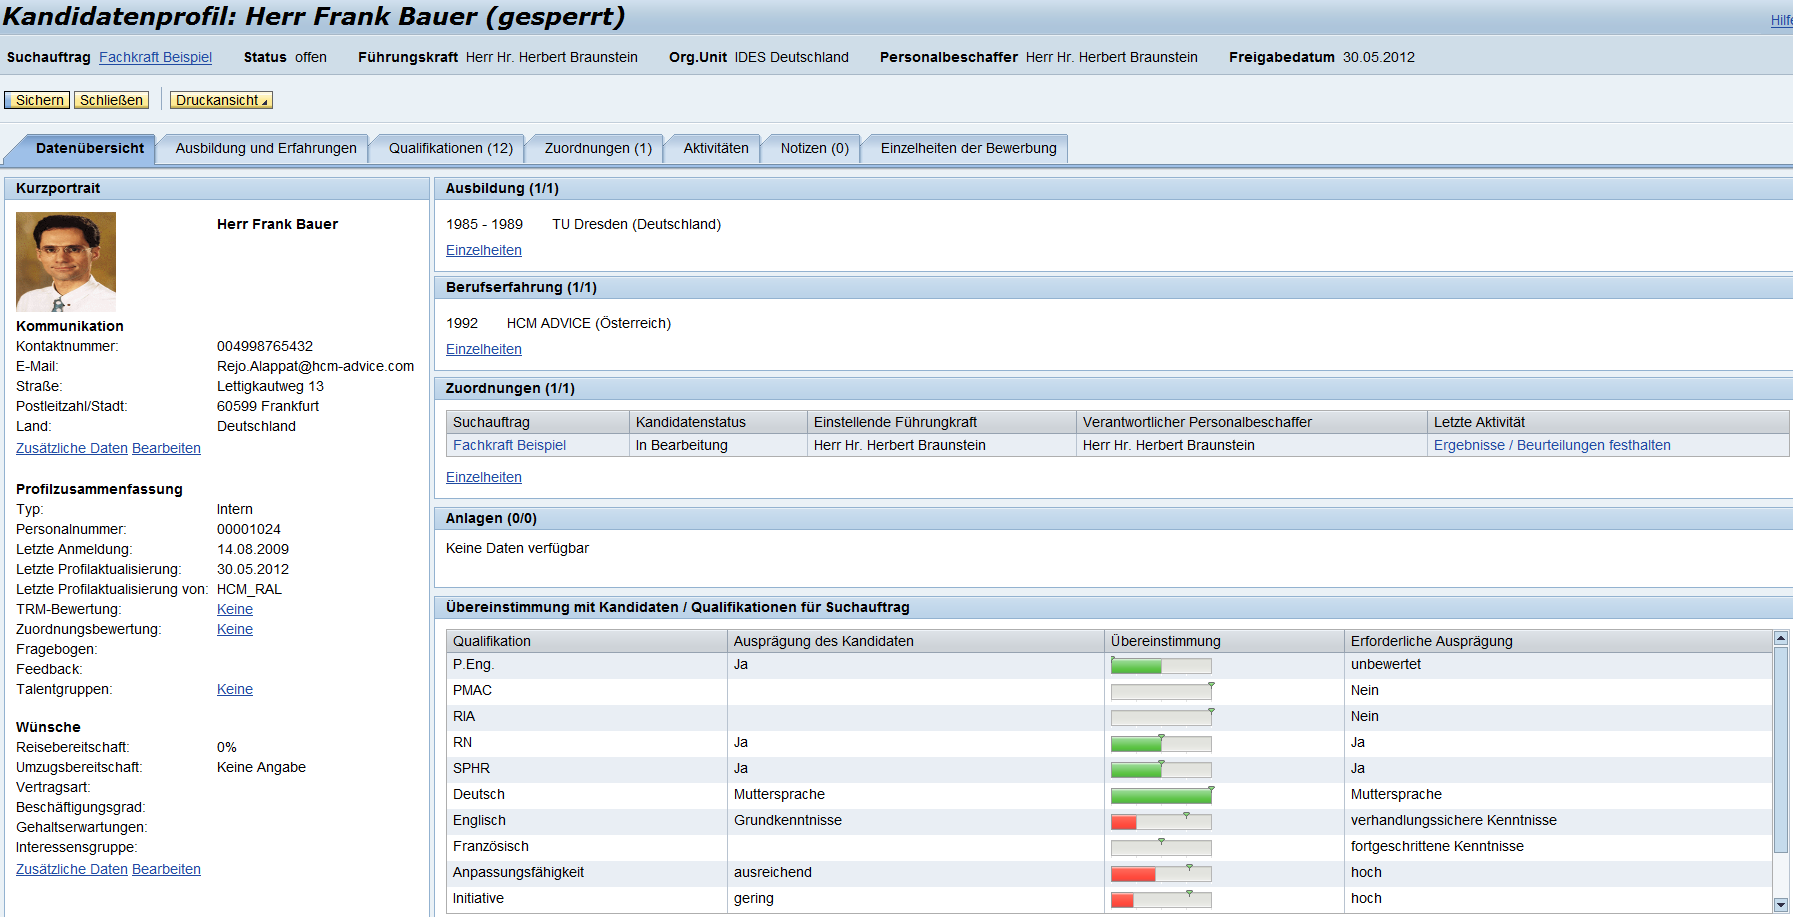 SAP Solutions - HCM ADVICE